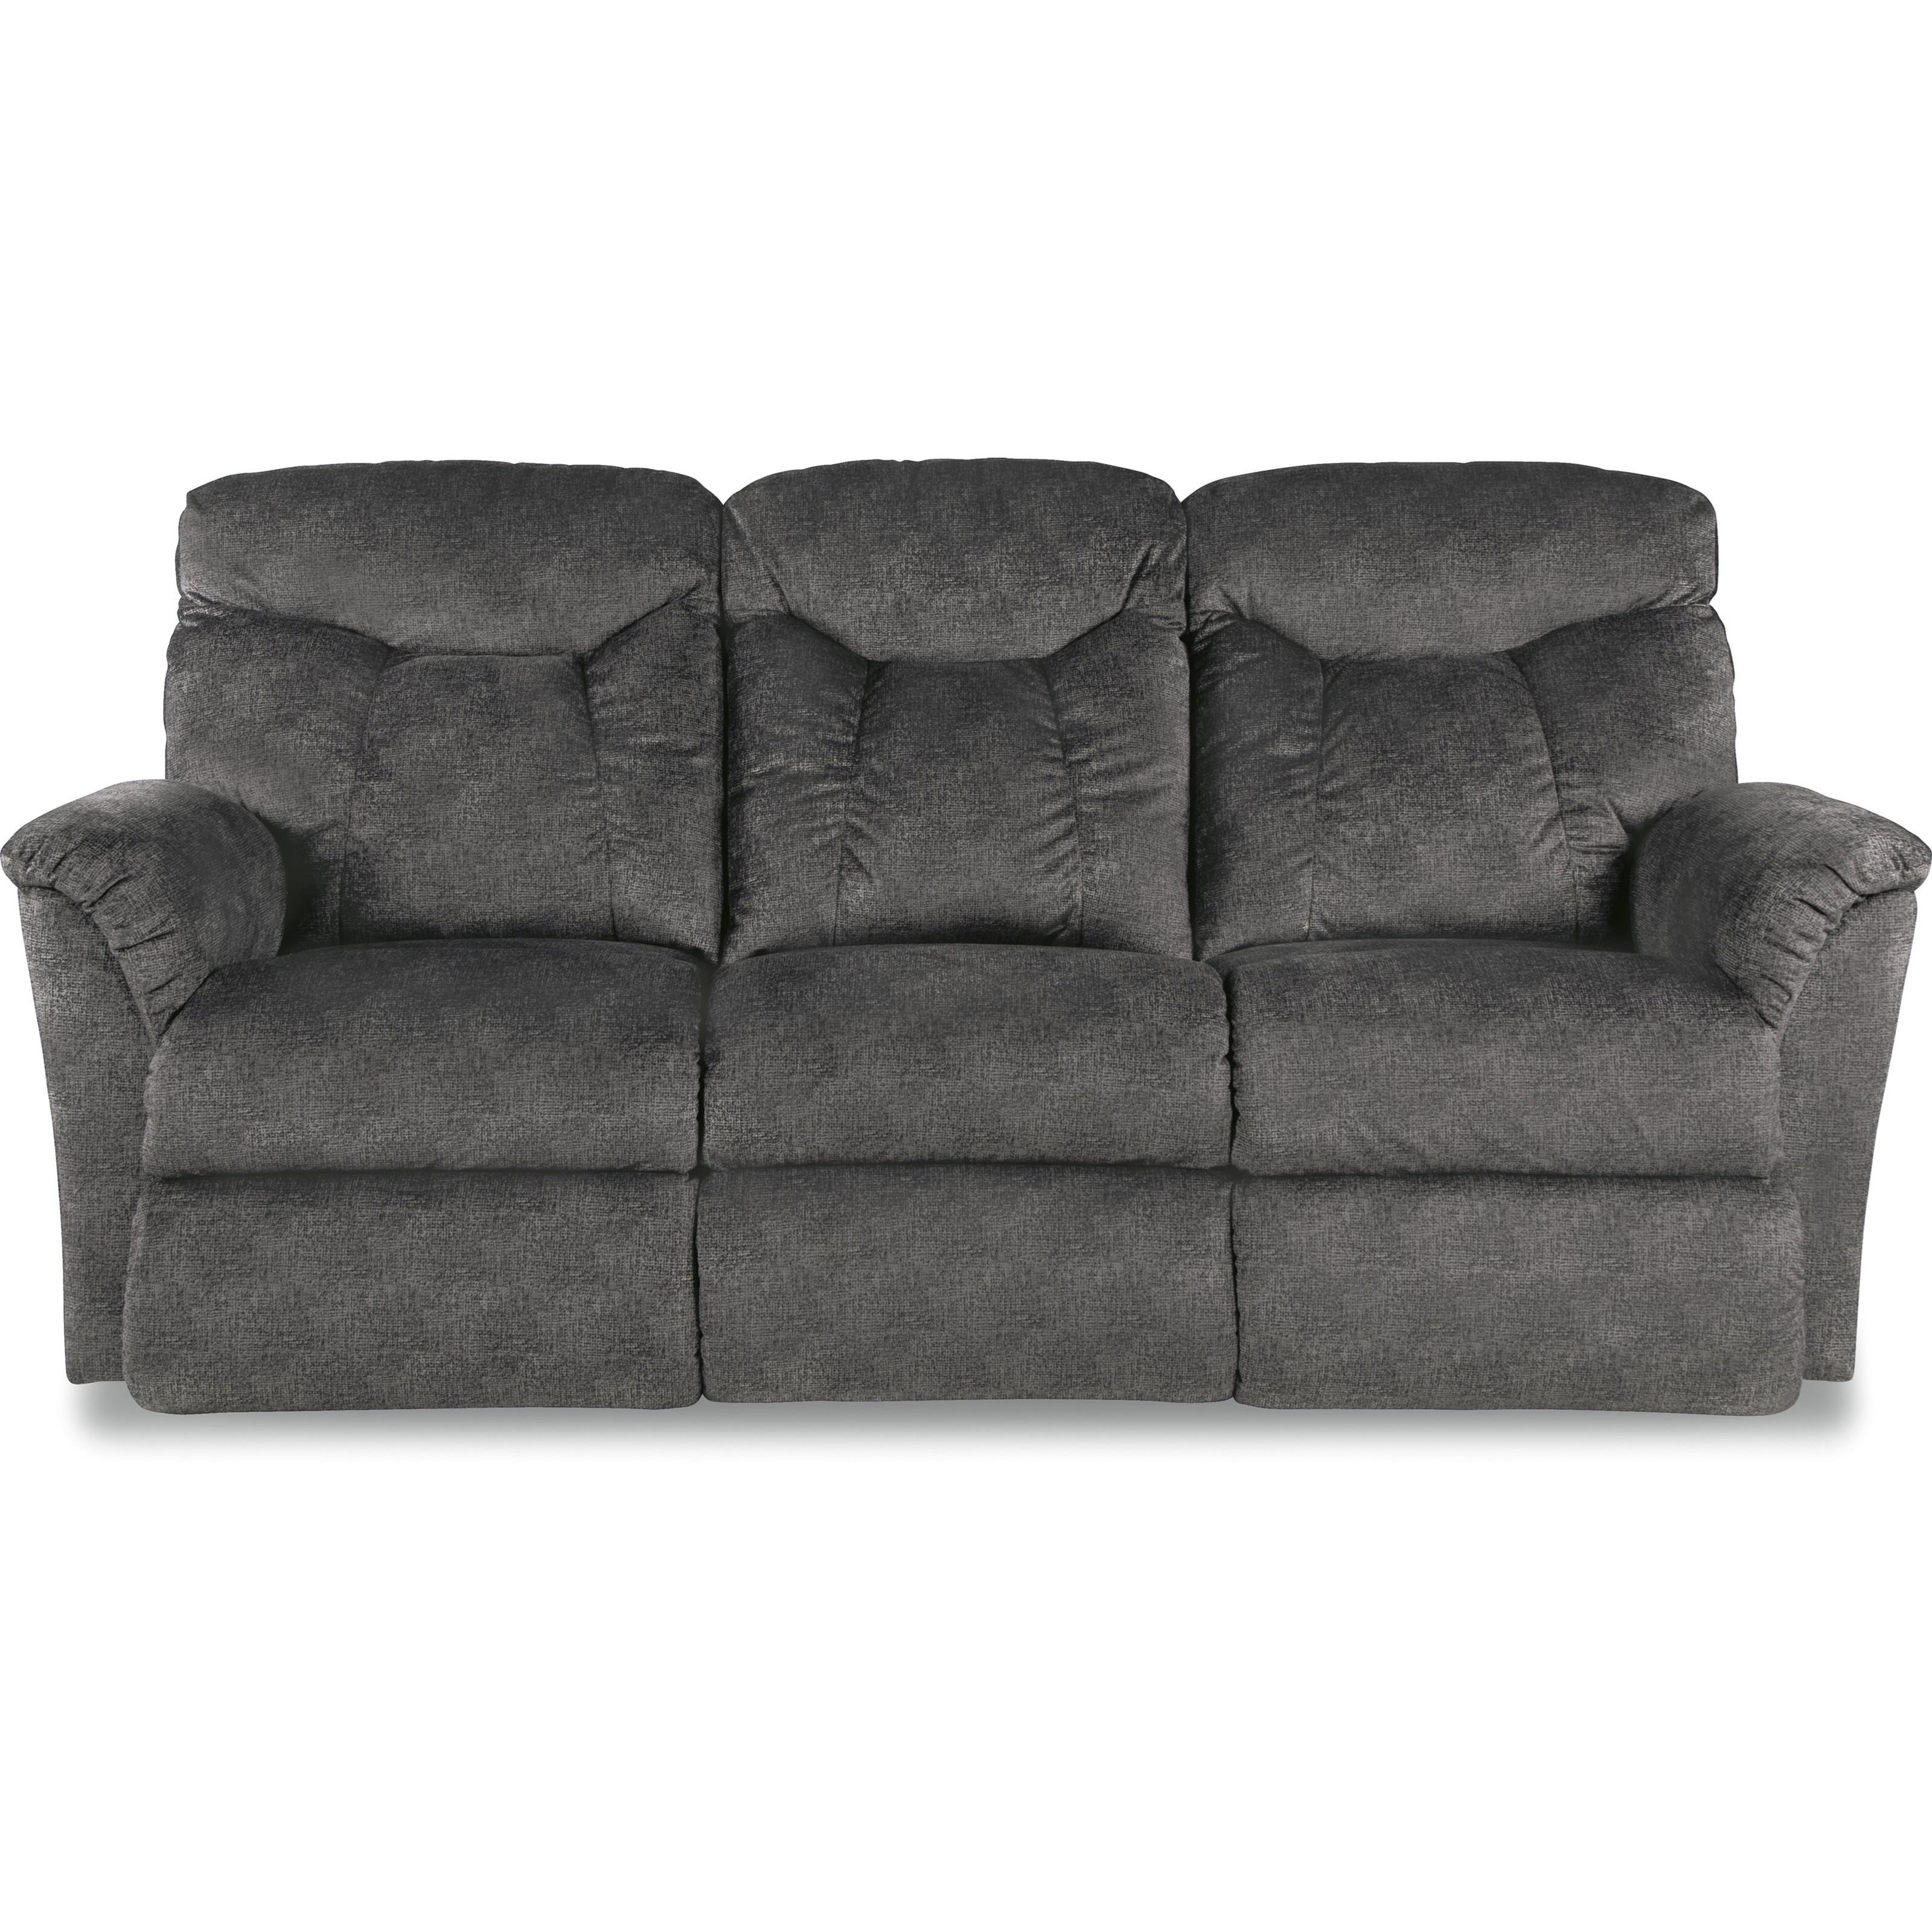 La Z Boy Fortune Casual Reclining Sofa Vandrie Home